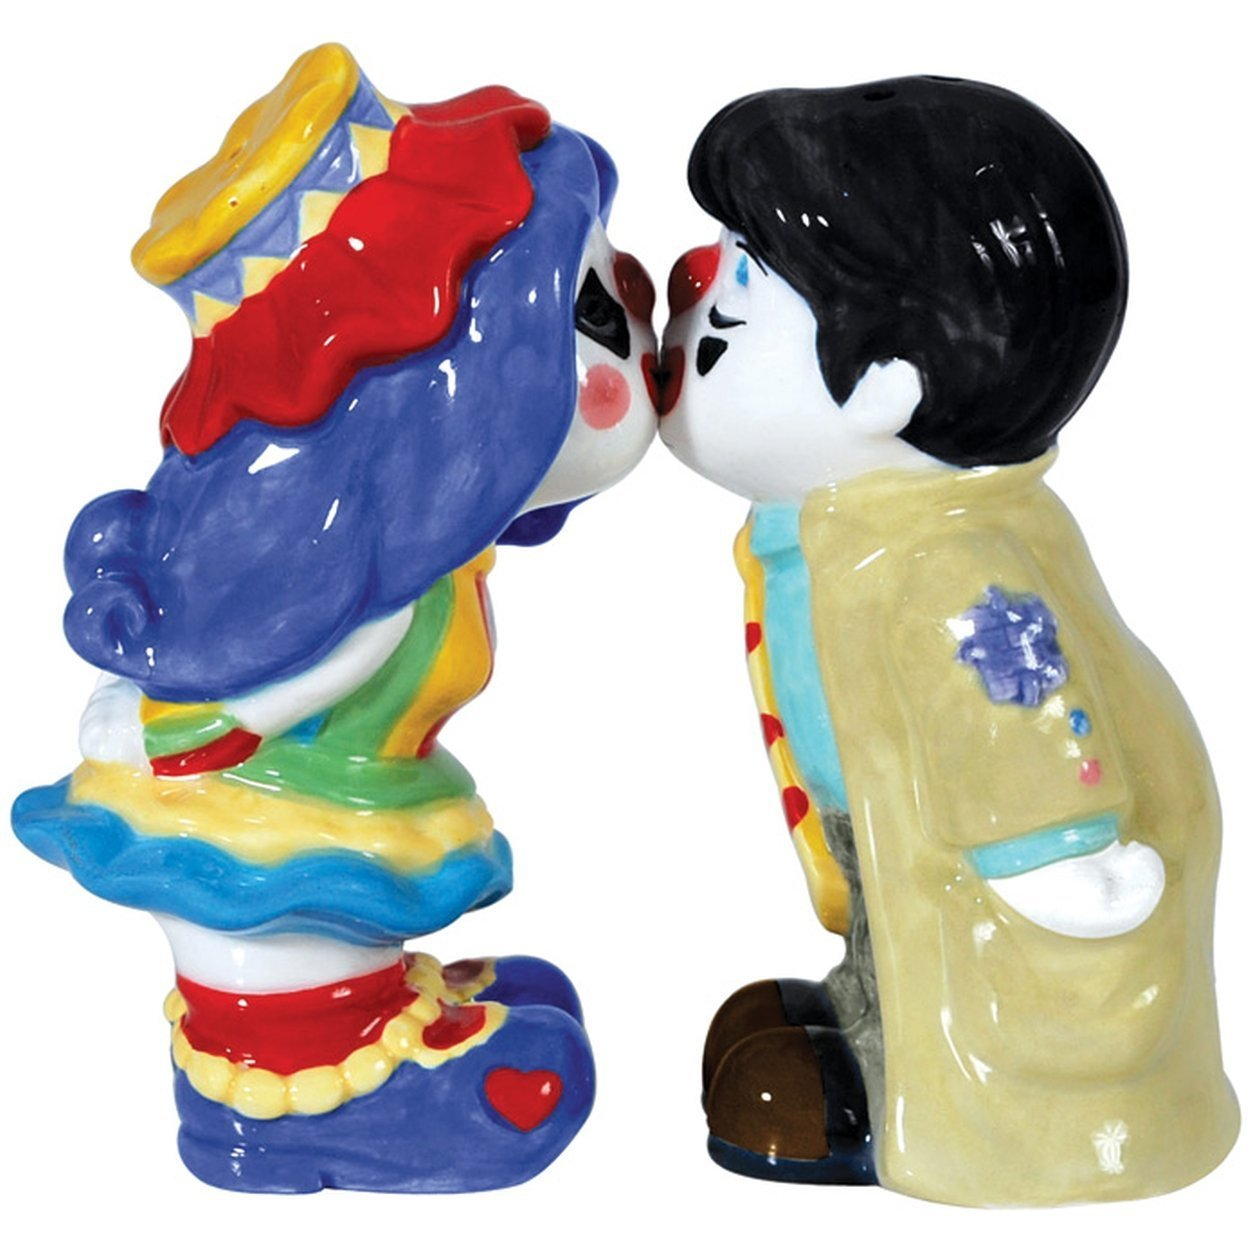 MWAH Clown Kissing Salt and Pepper